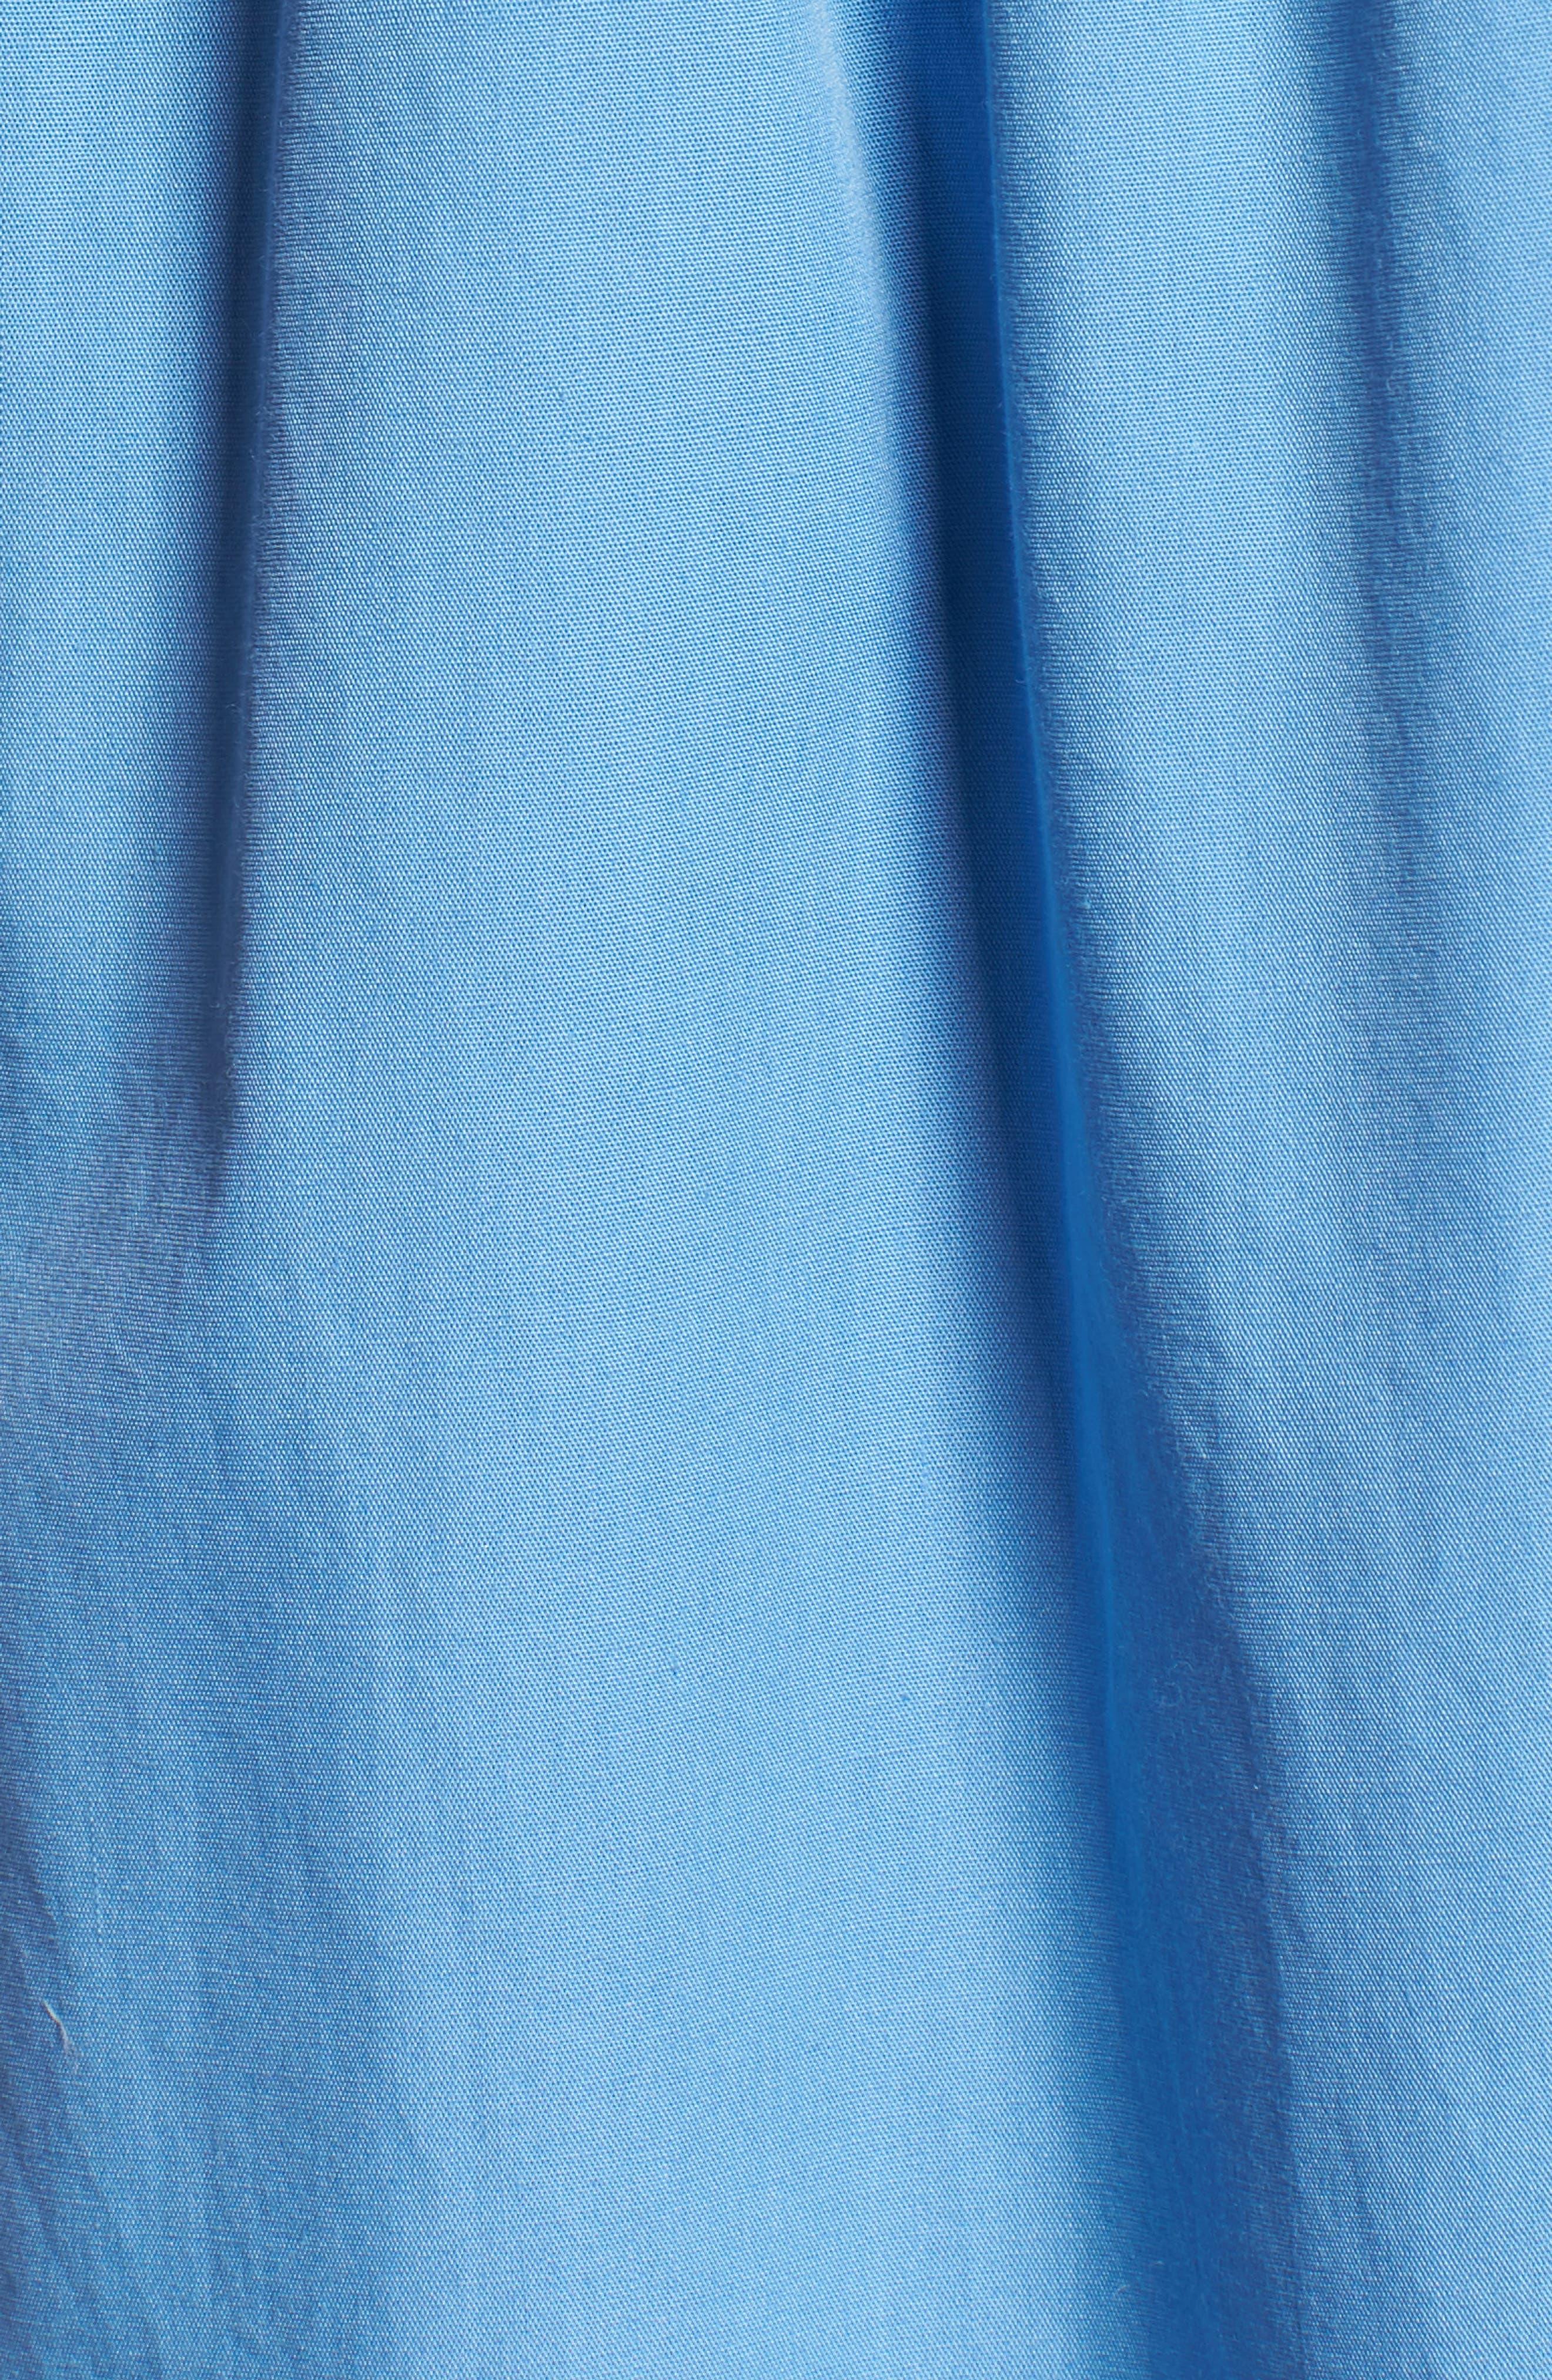 Button Front Midi Dress,                             Alternate thumbnail 10, color,